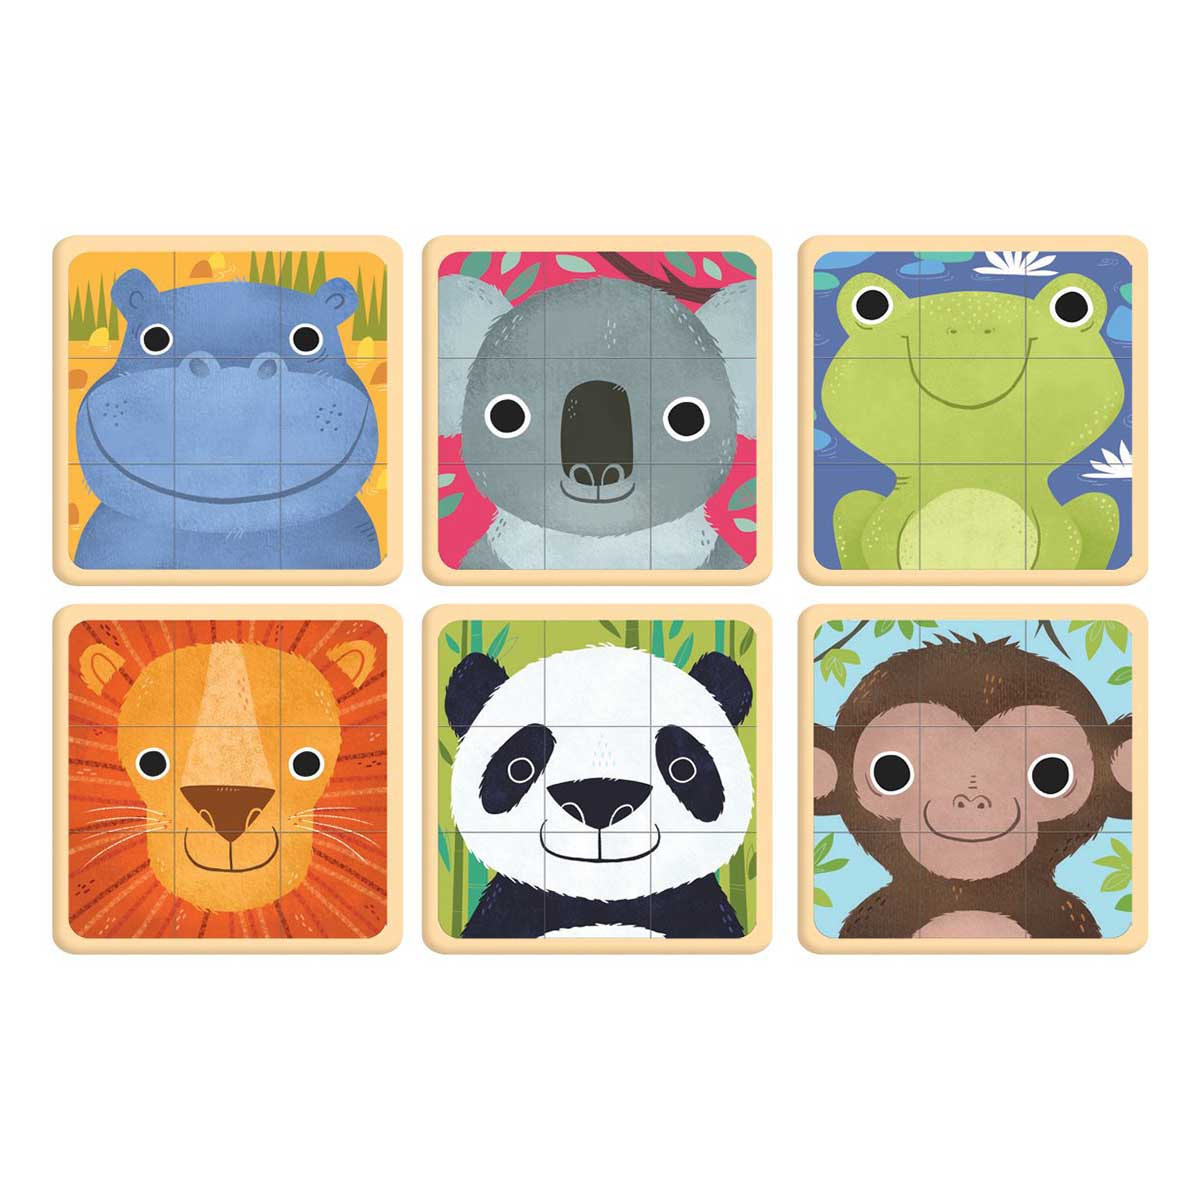 Animals of the World Animals Jigsaw Puzzle